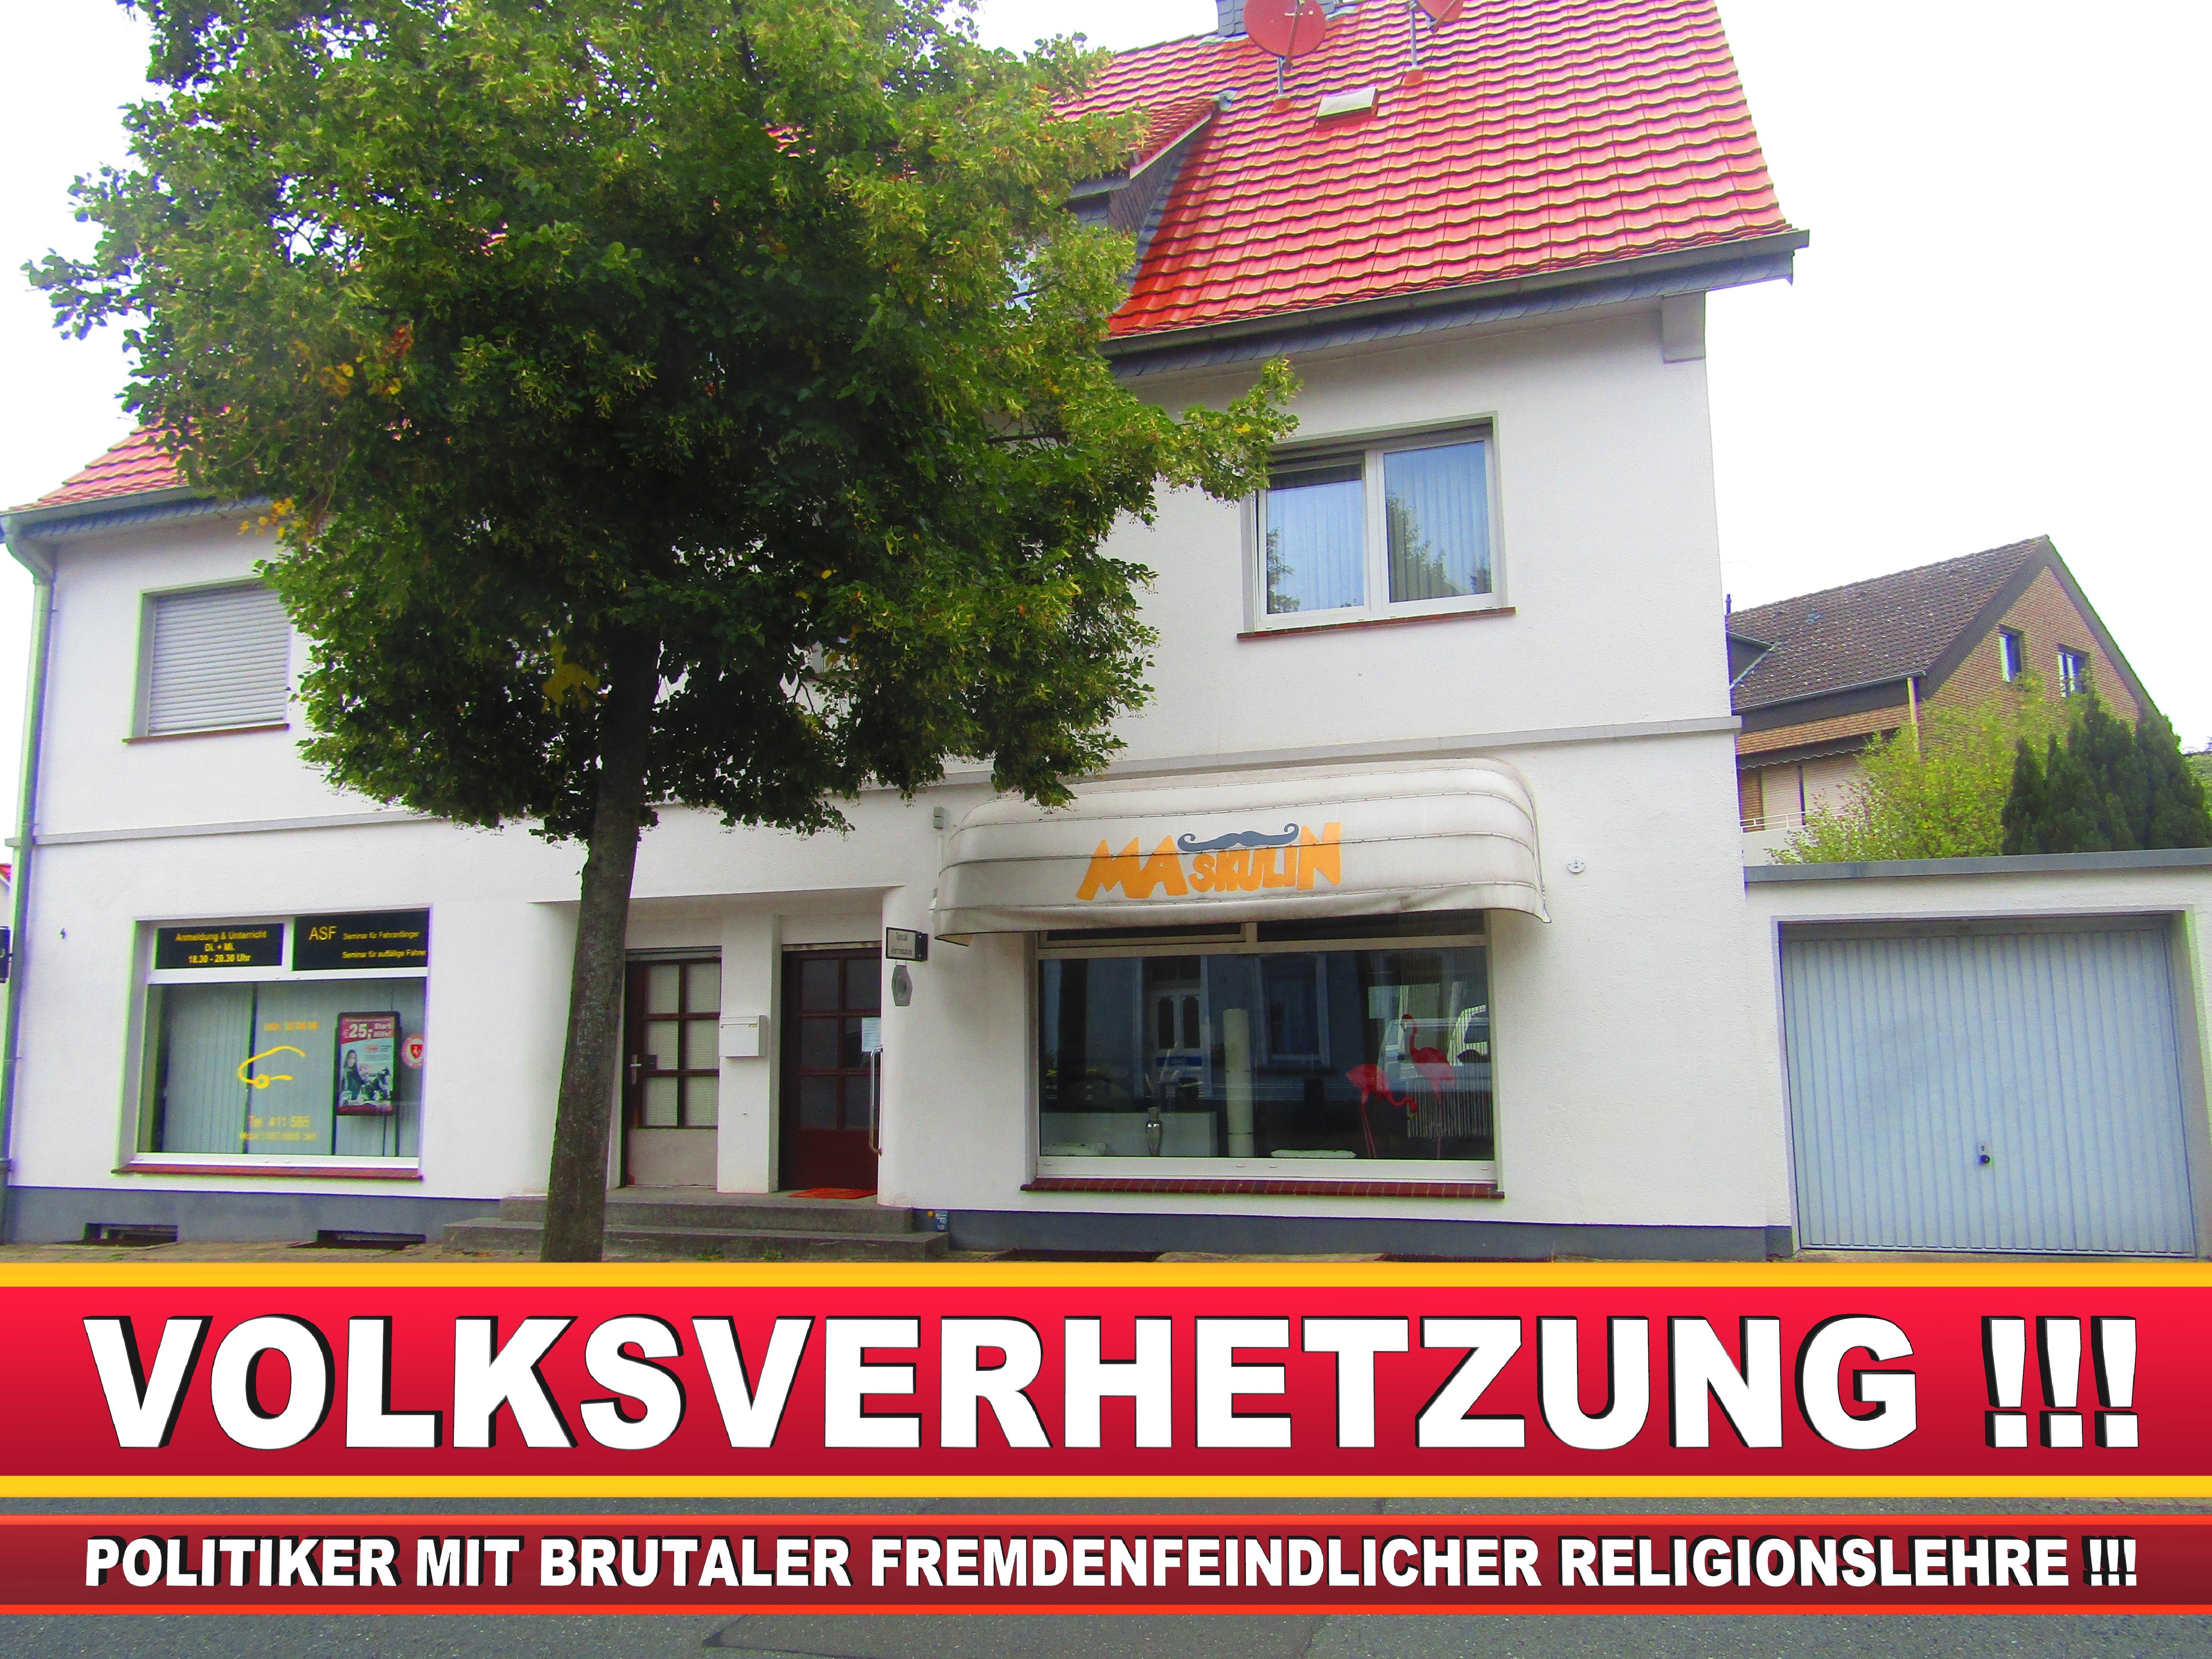 MASKULIN BIELEFELD FRISEUR SALON CDU BIELEFELD (2) LANDTAGSWAHL BUNDESTAGSWAHL BÜRGERMEISTERWAHL